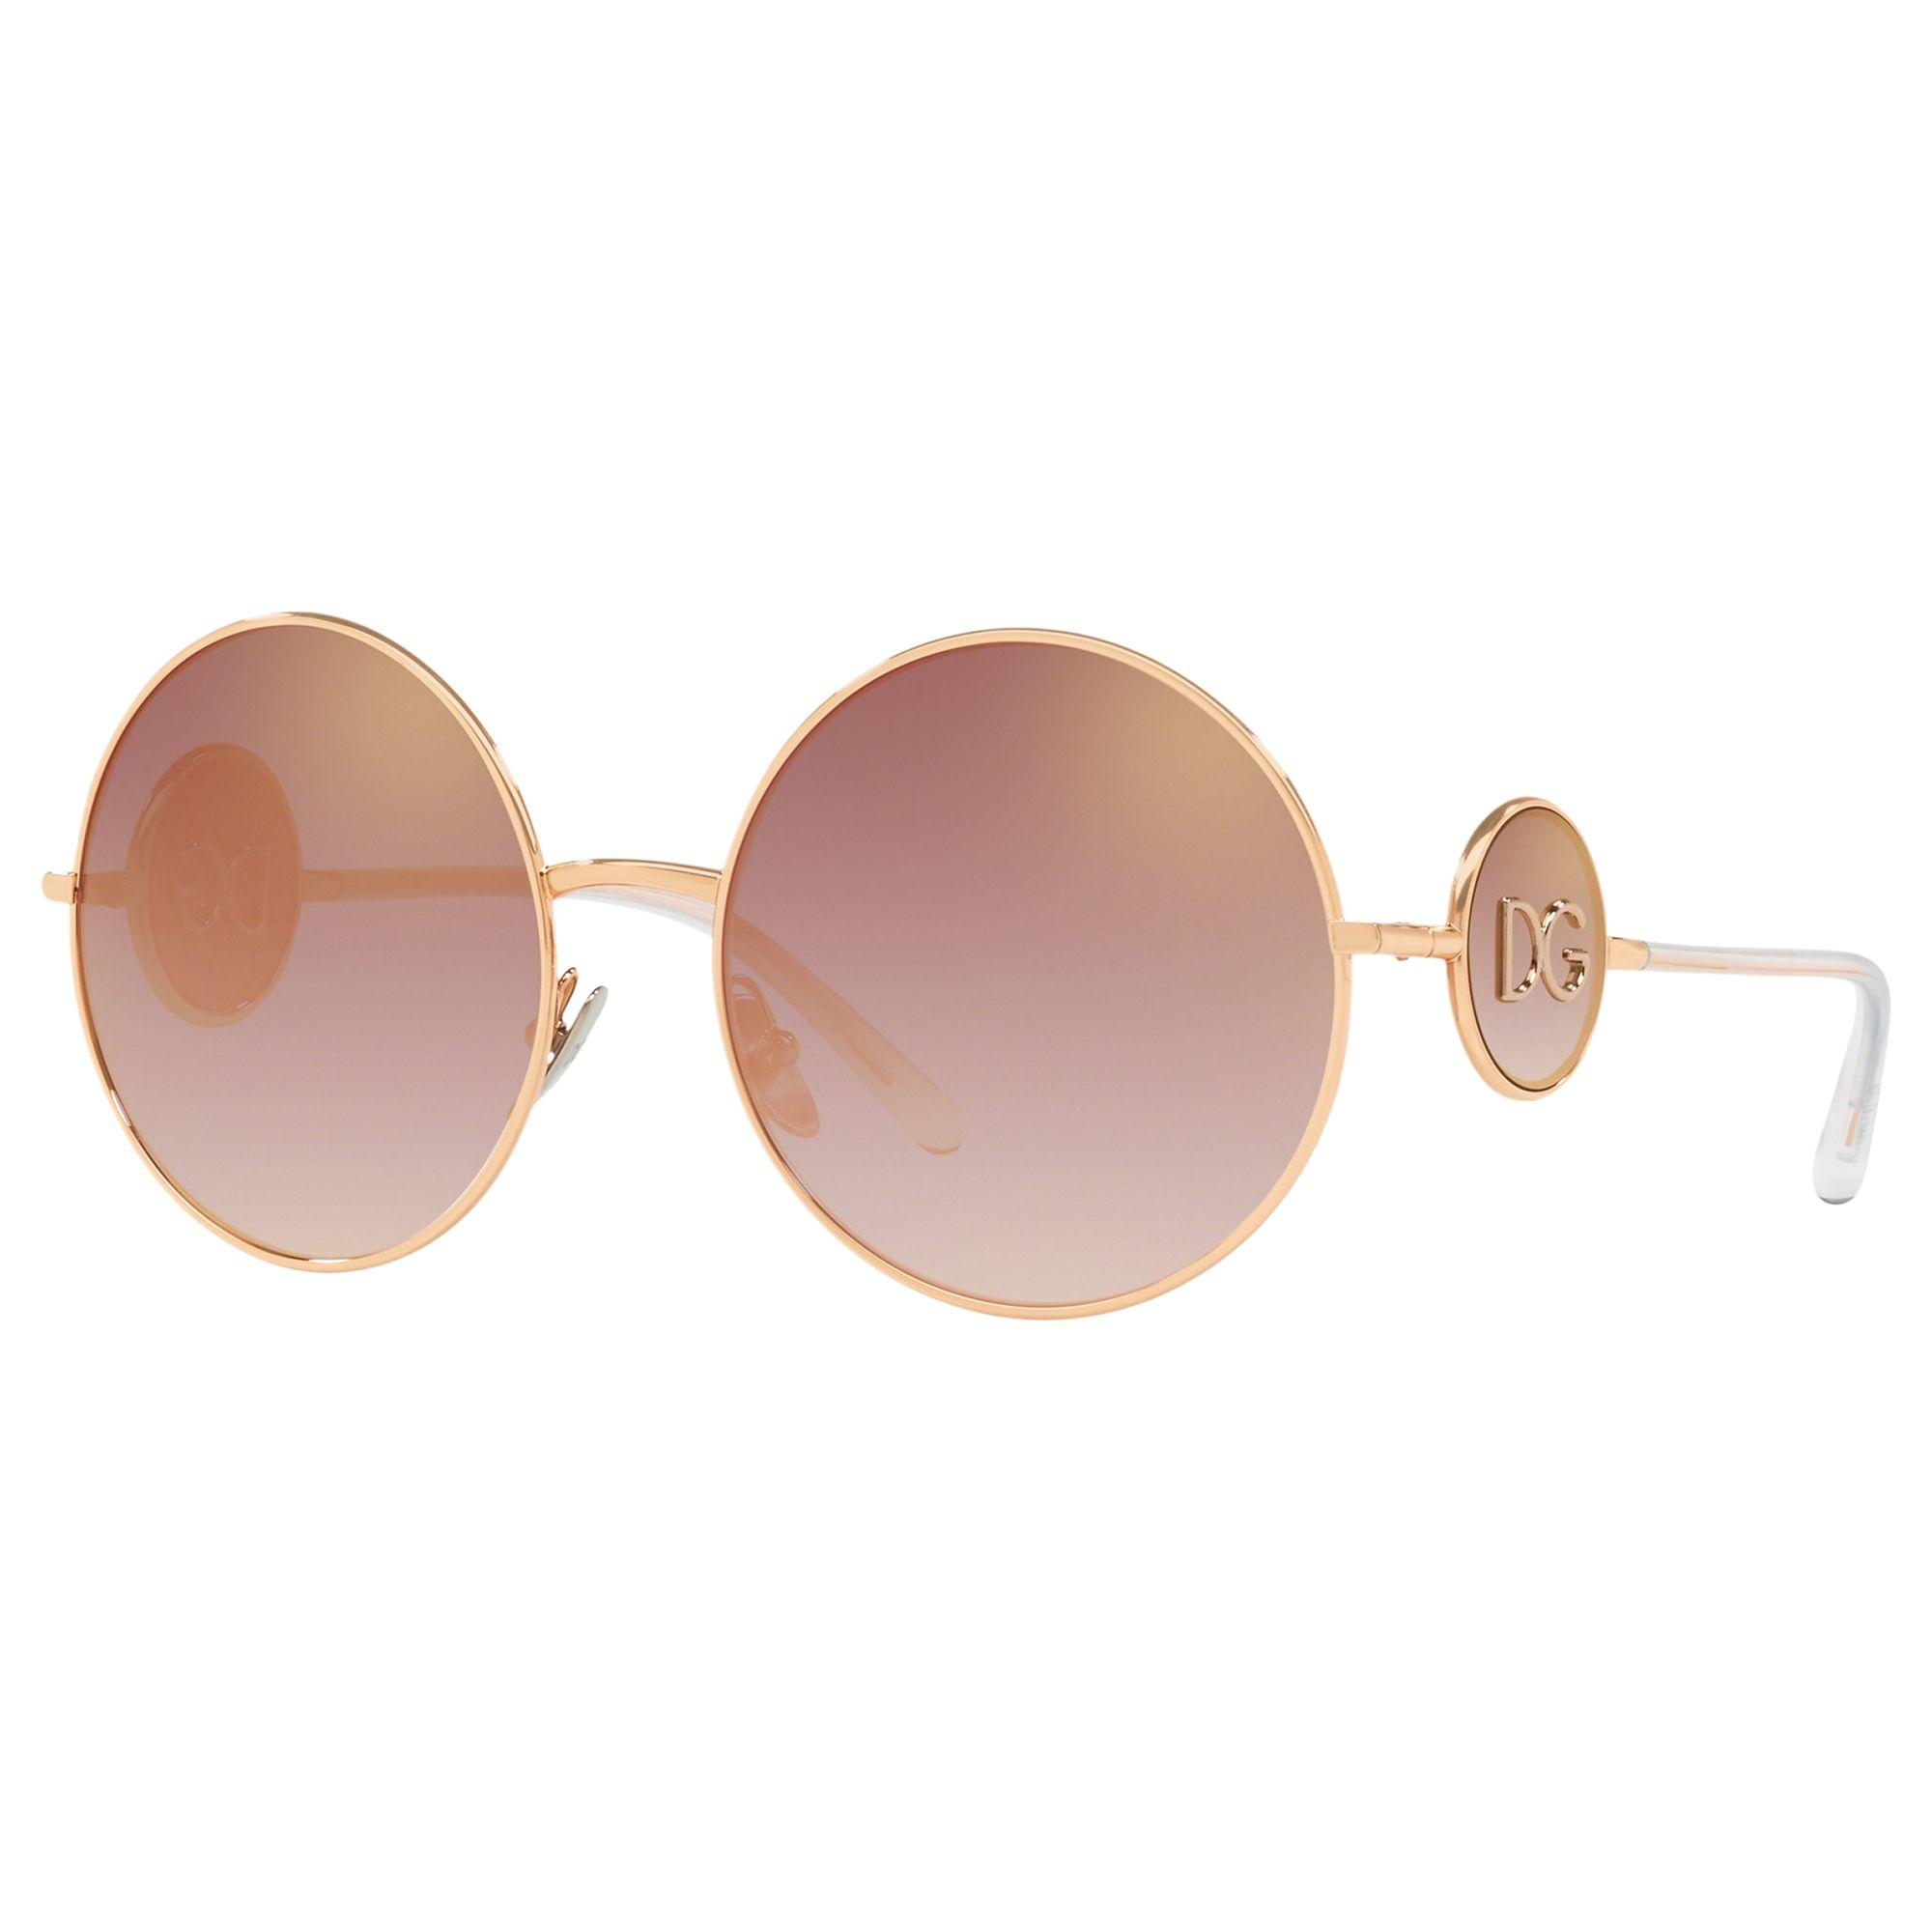 Dolce & Gabbana Dolce & Gabbana DG2205 Women's Round Sunglasses, Gold/Pink